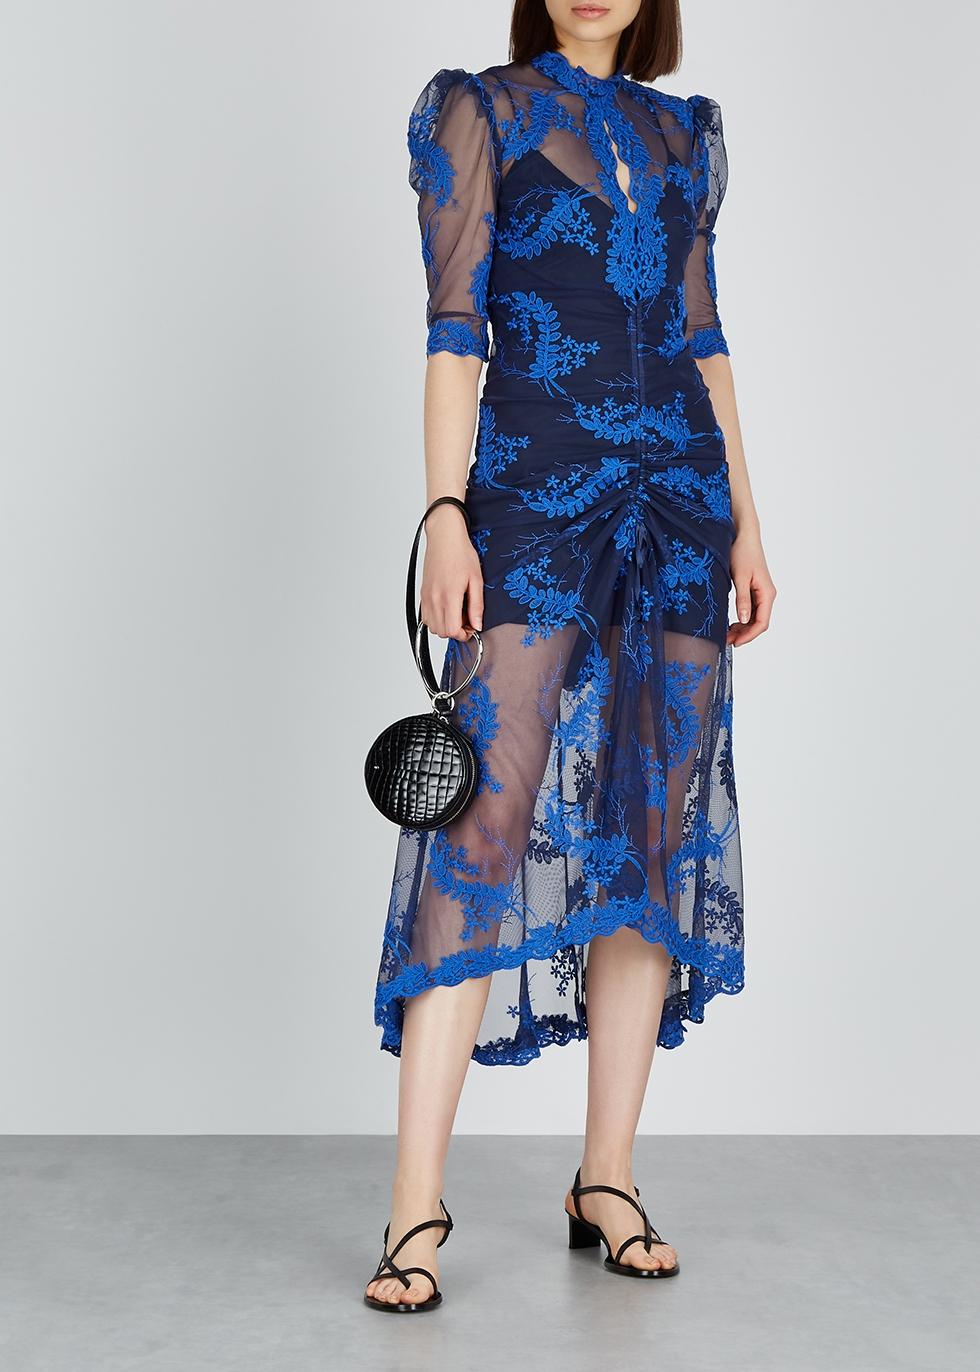 2c016e9ef9a0 New In - Women s Designer Fashion - Harvey Nichols